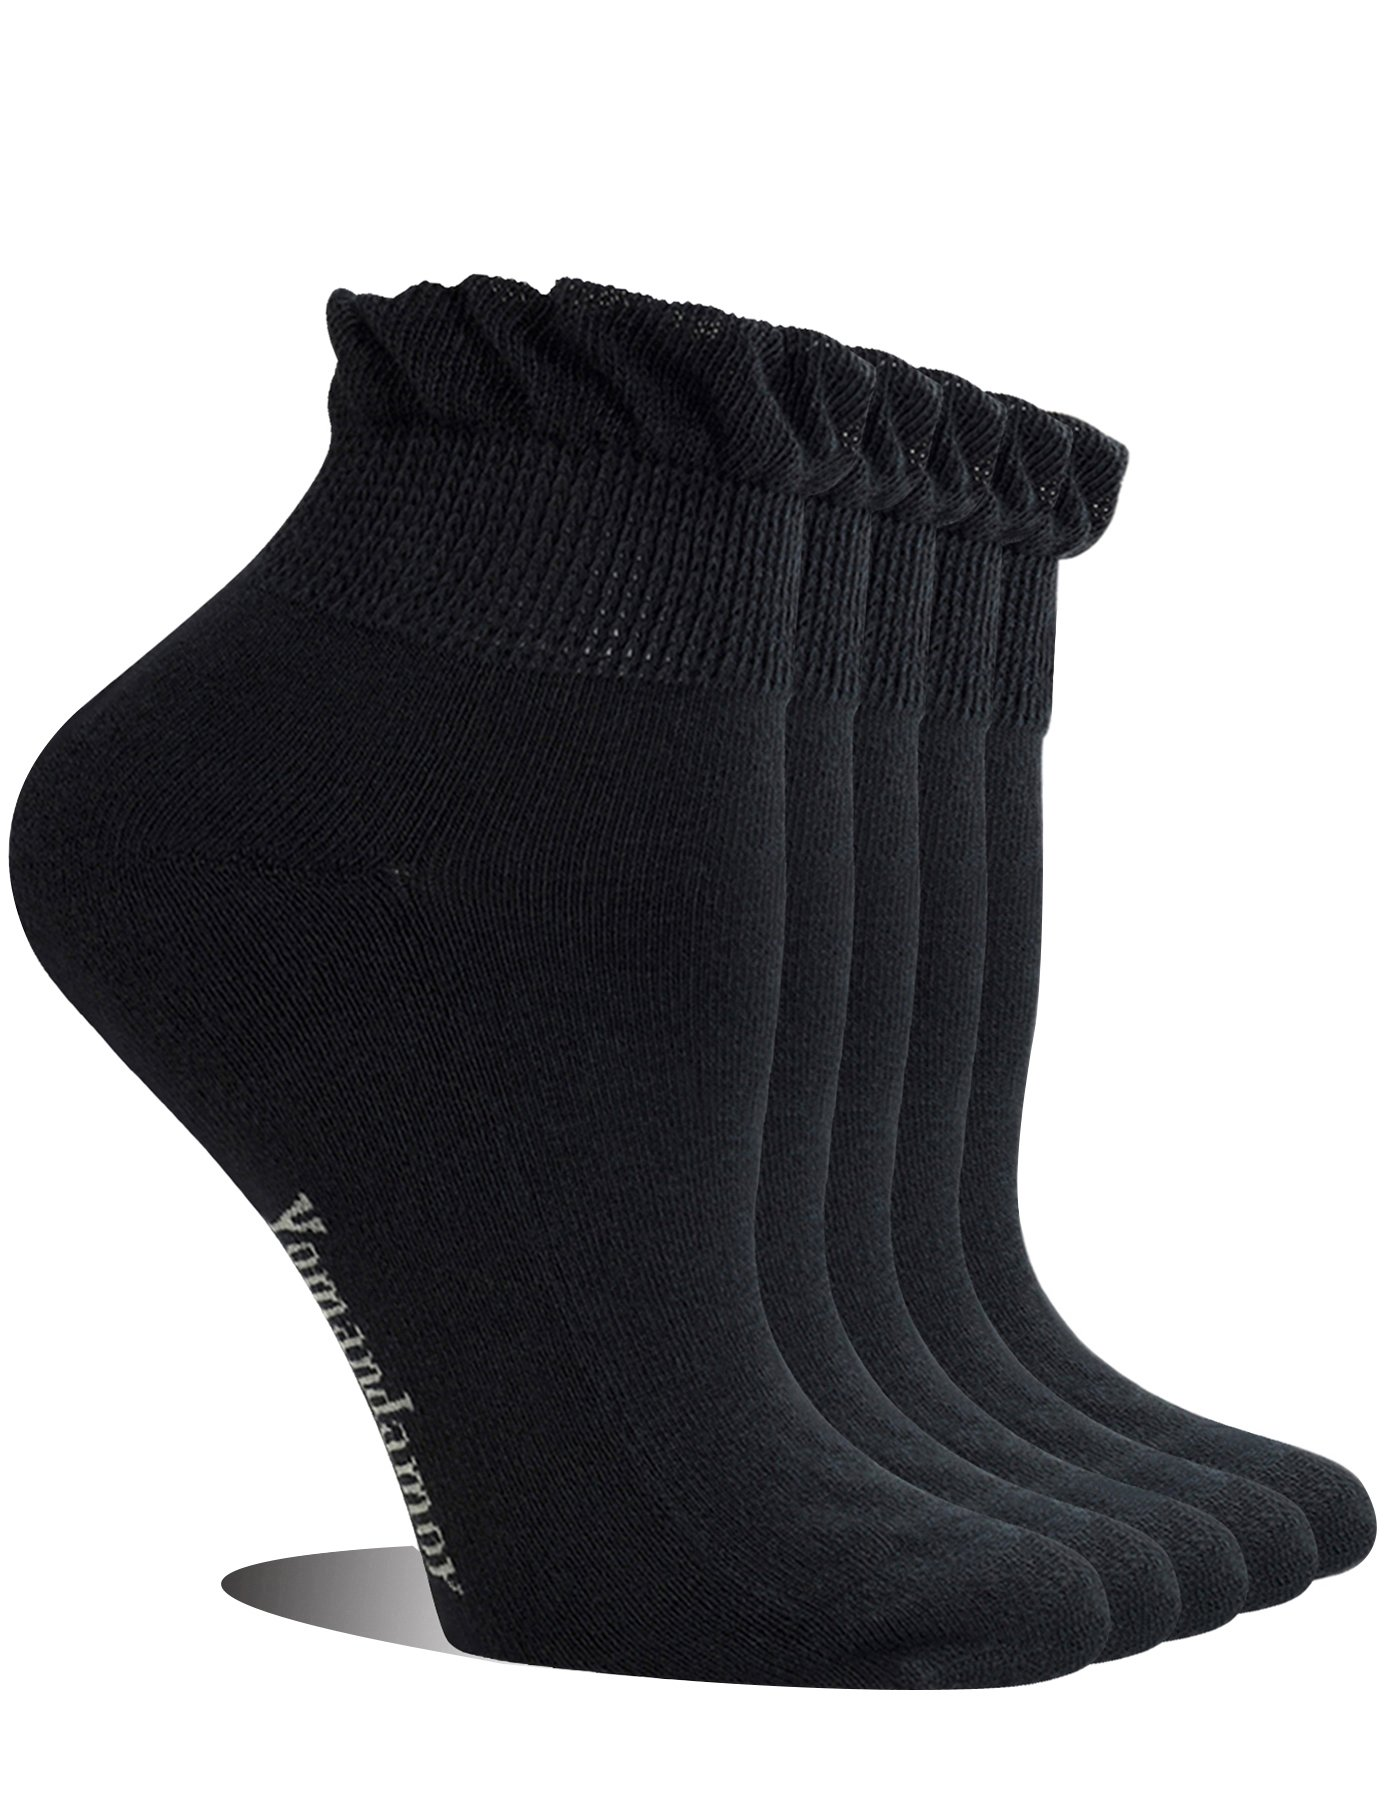 Yomandamor Women's 5 Pairs Non-binding Bamboo Diabetic Ankle Dress/Casual Socks with Seamless Toe